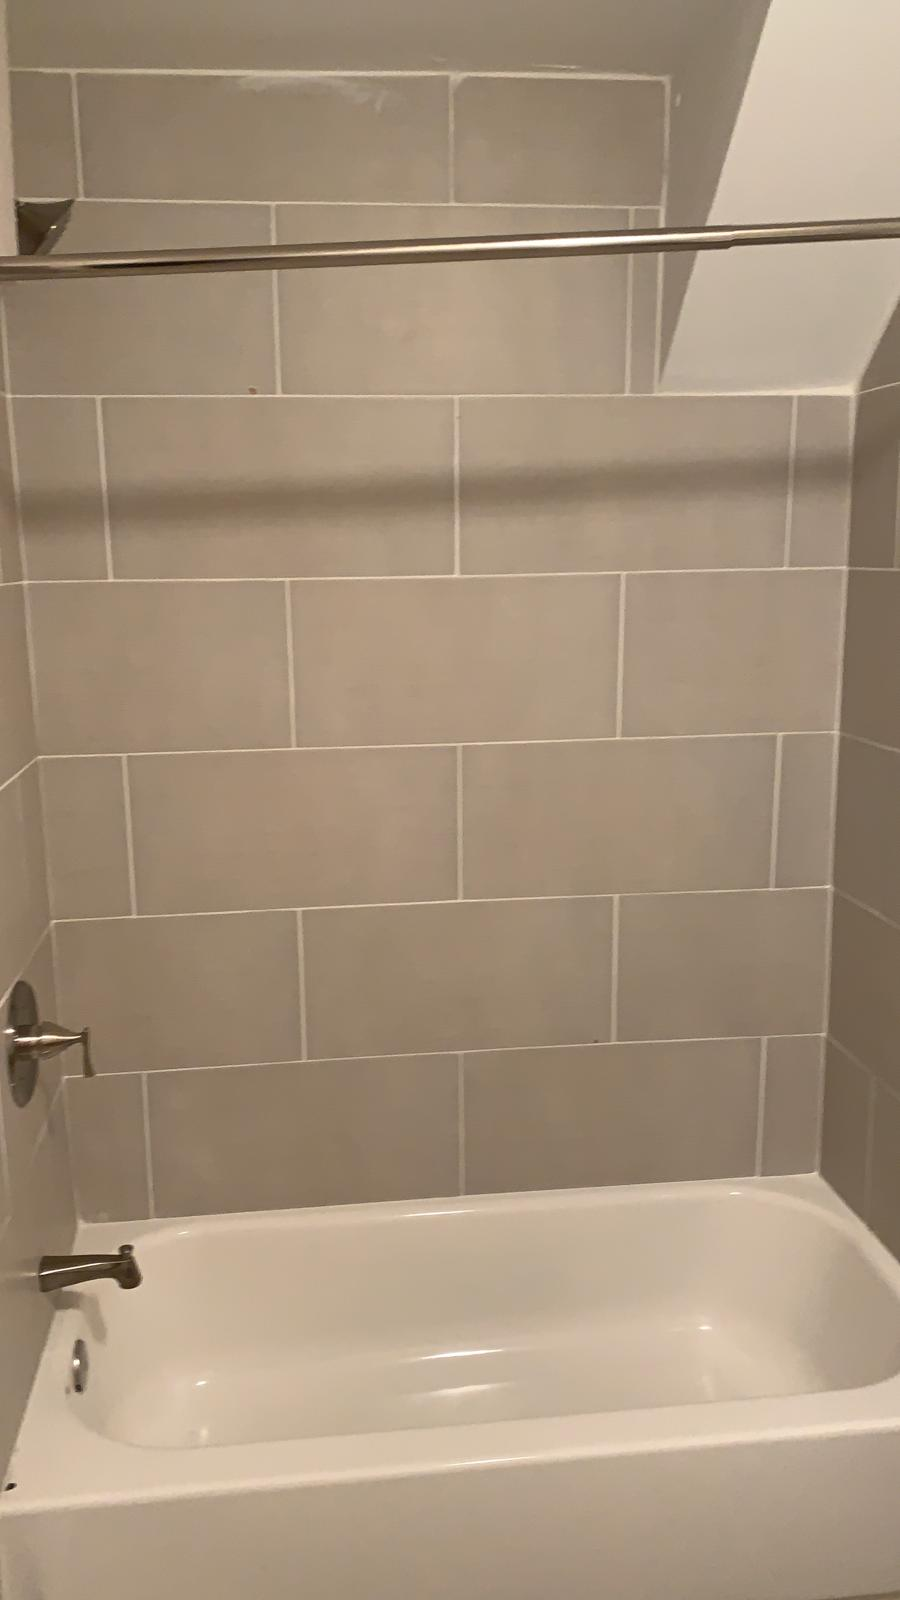 Tiled Bathtub 1808 Mcculloh